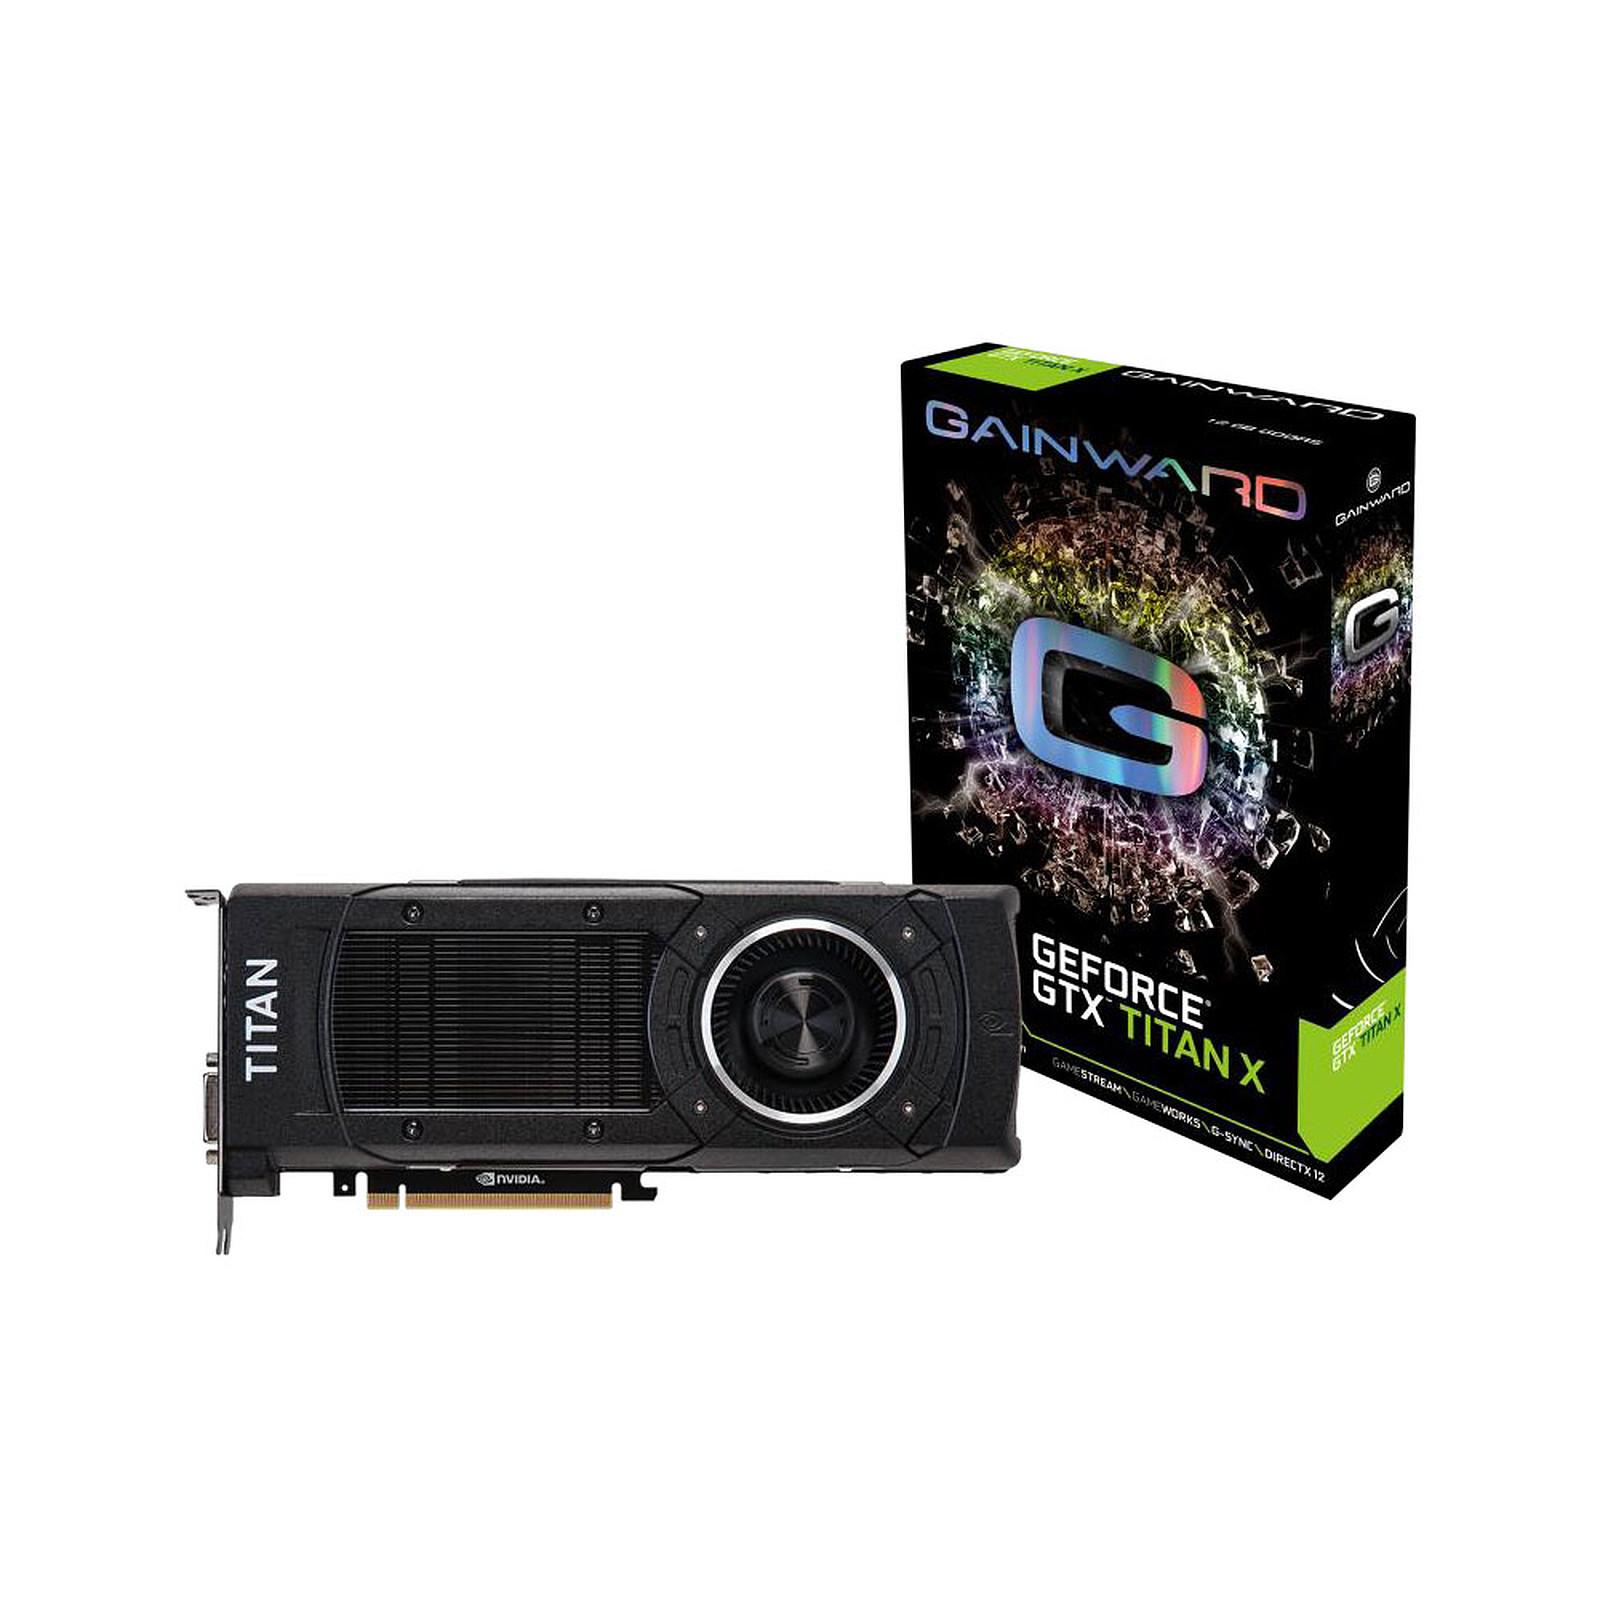 Gainward GeForce GTX TITAN X 12GB